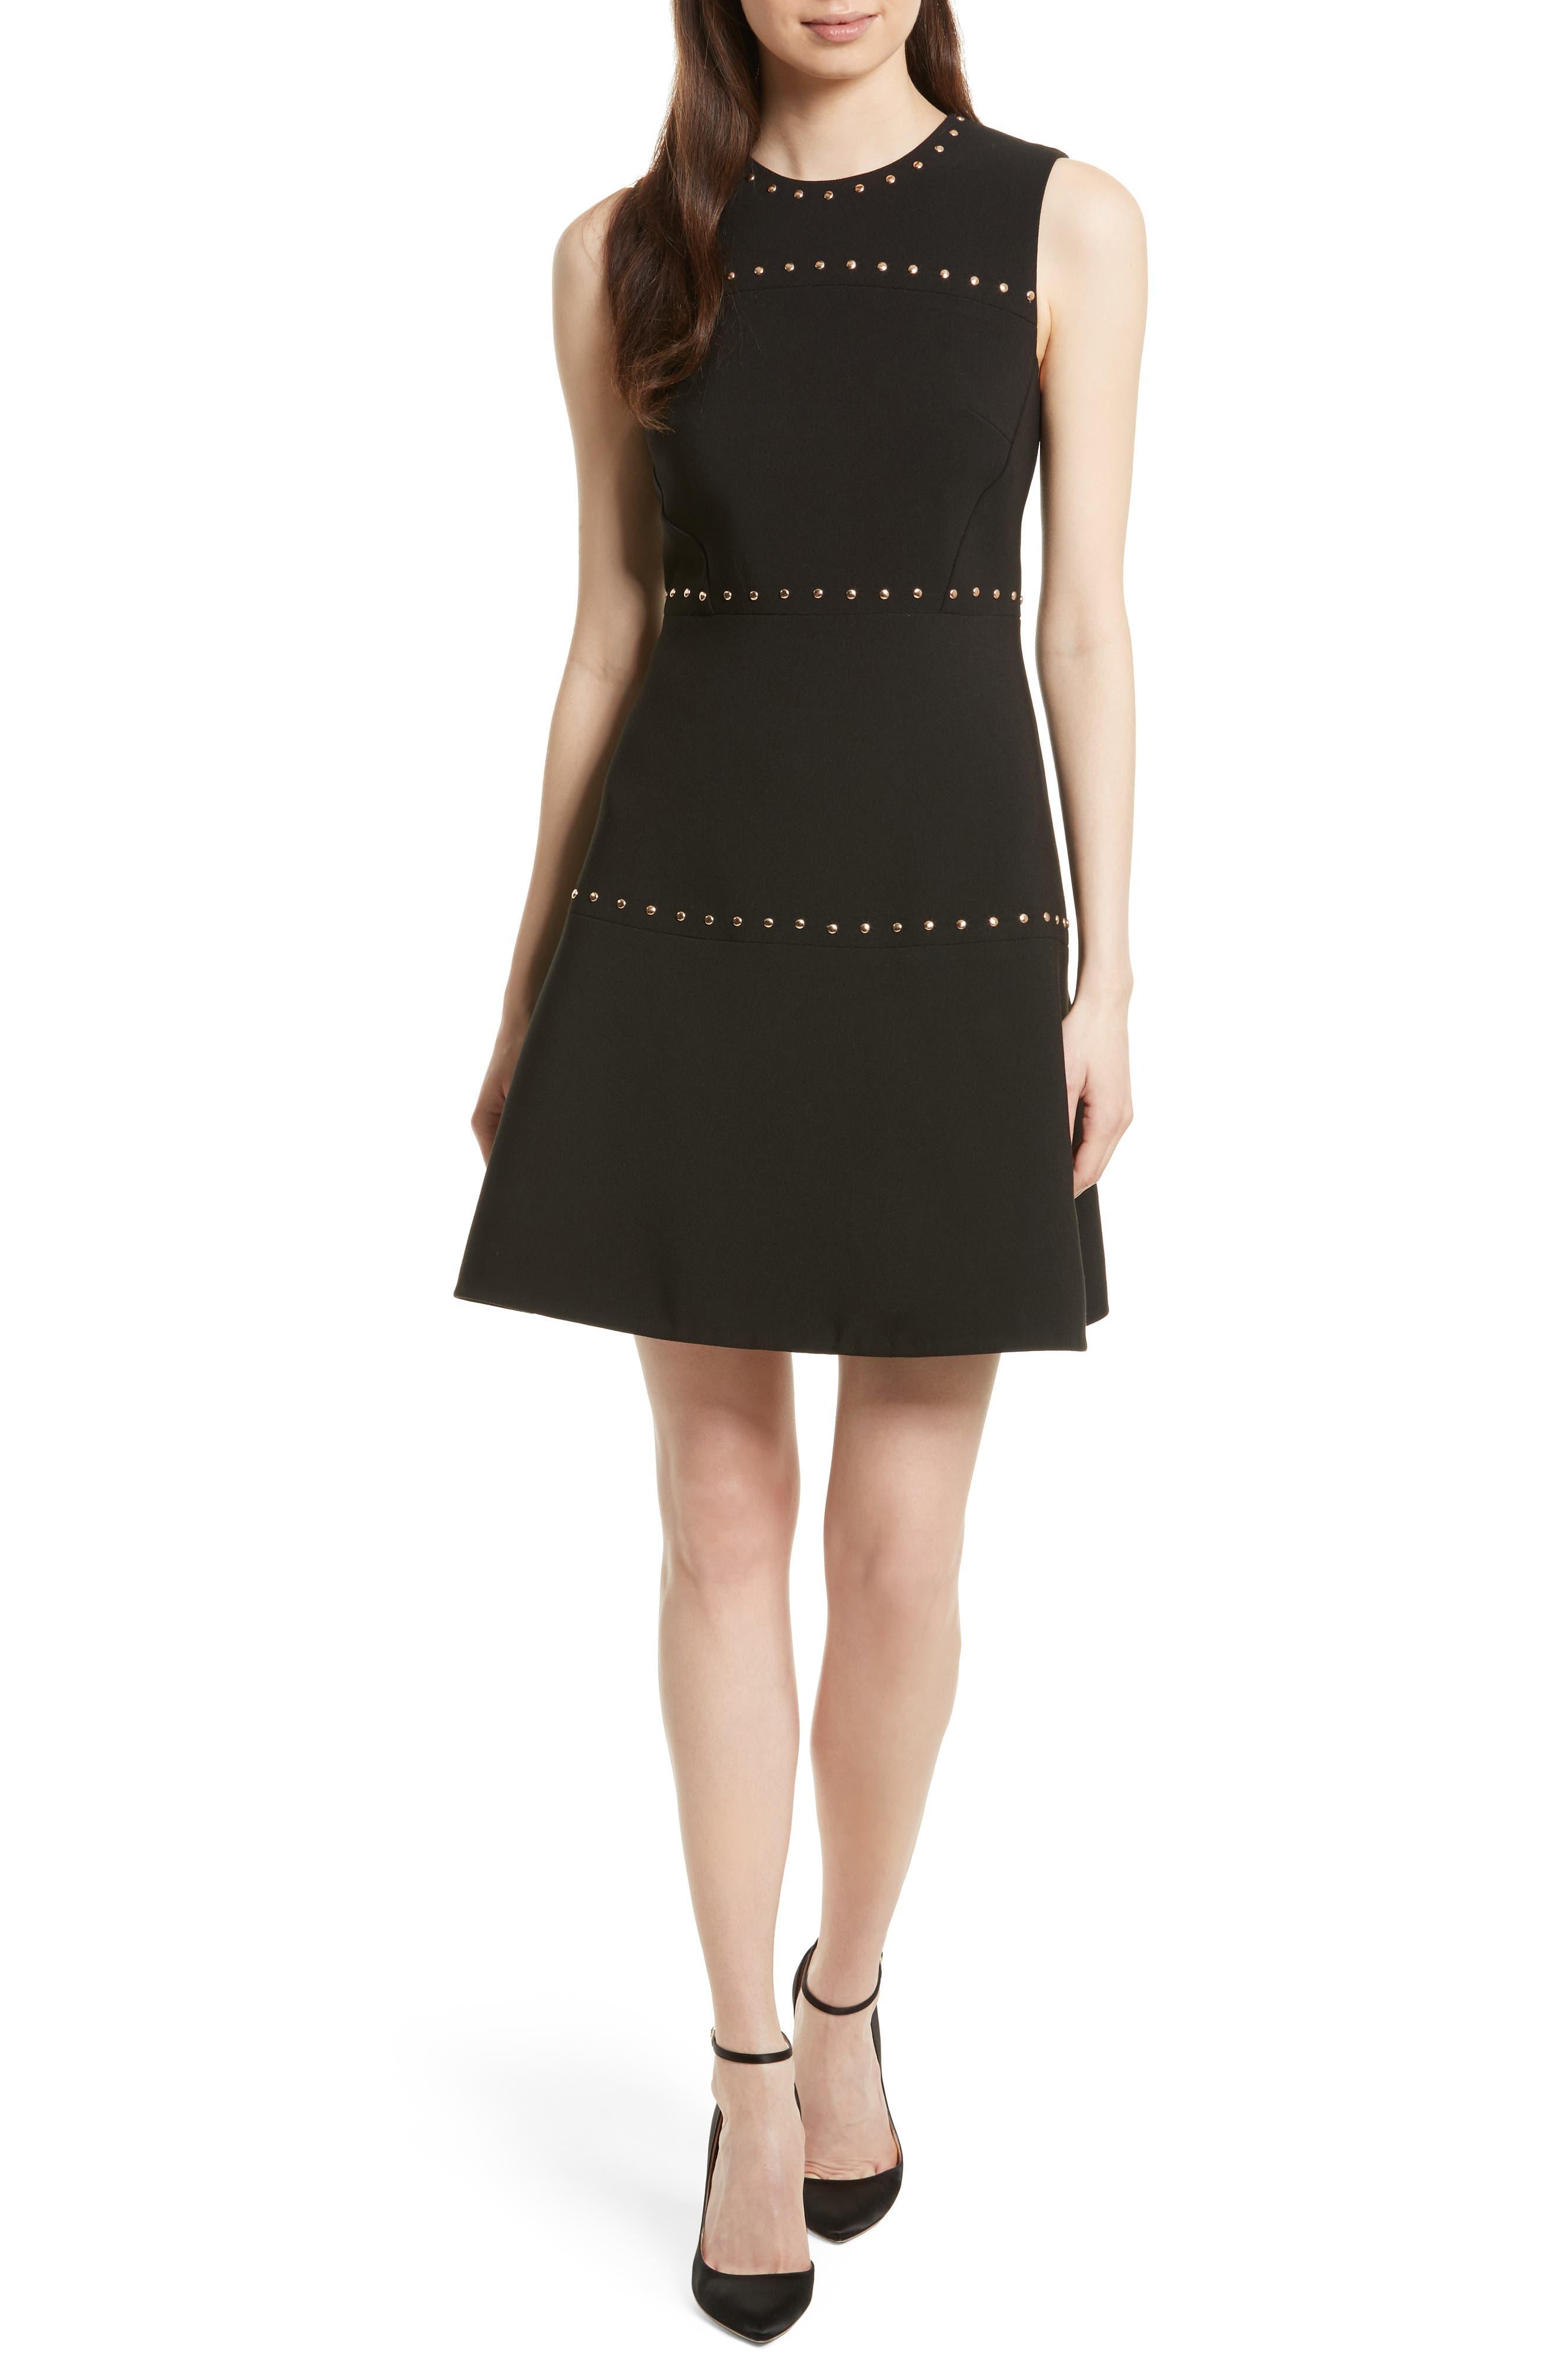 KATE SPADE NEW YORK studded a-line crepe dress